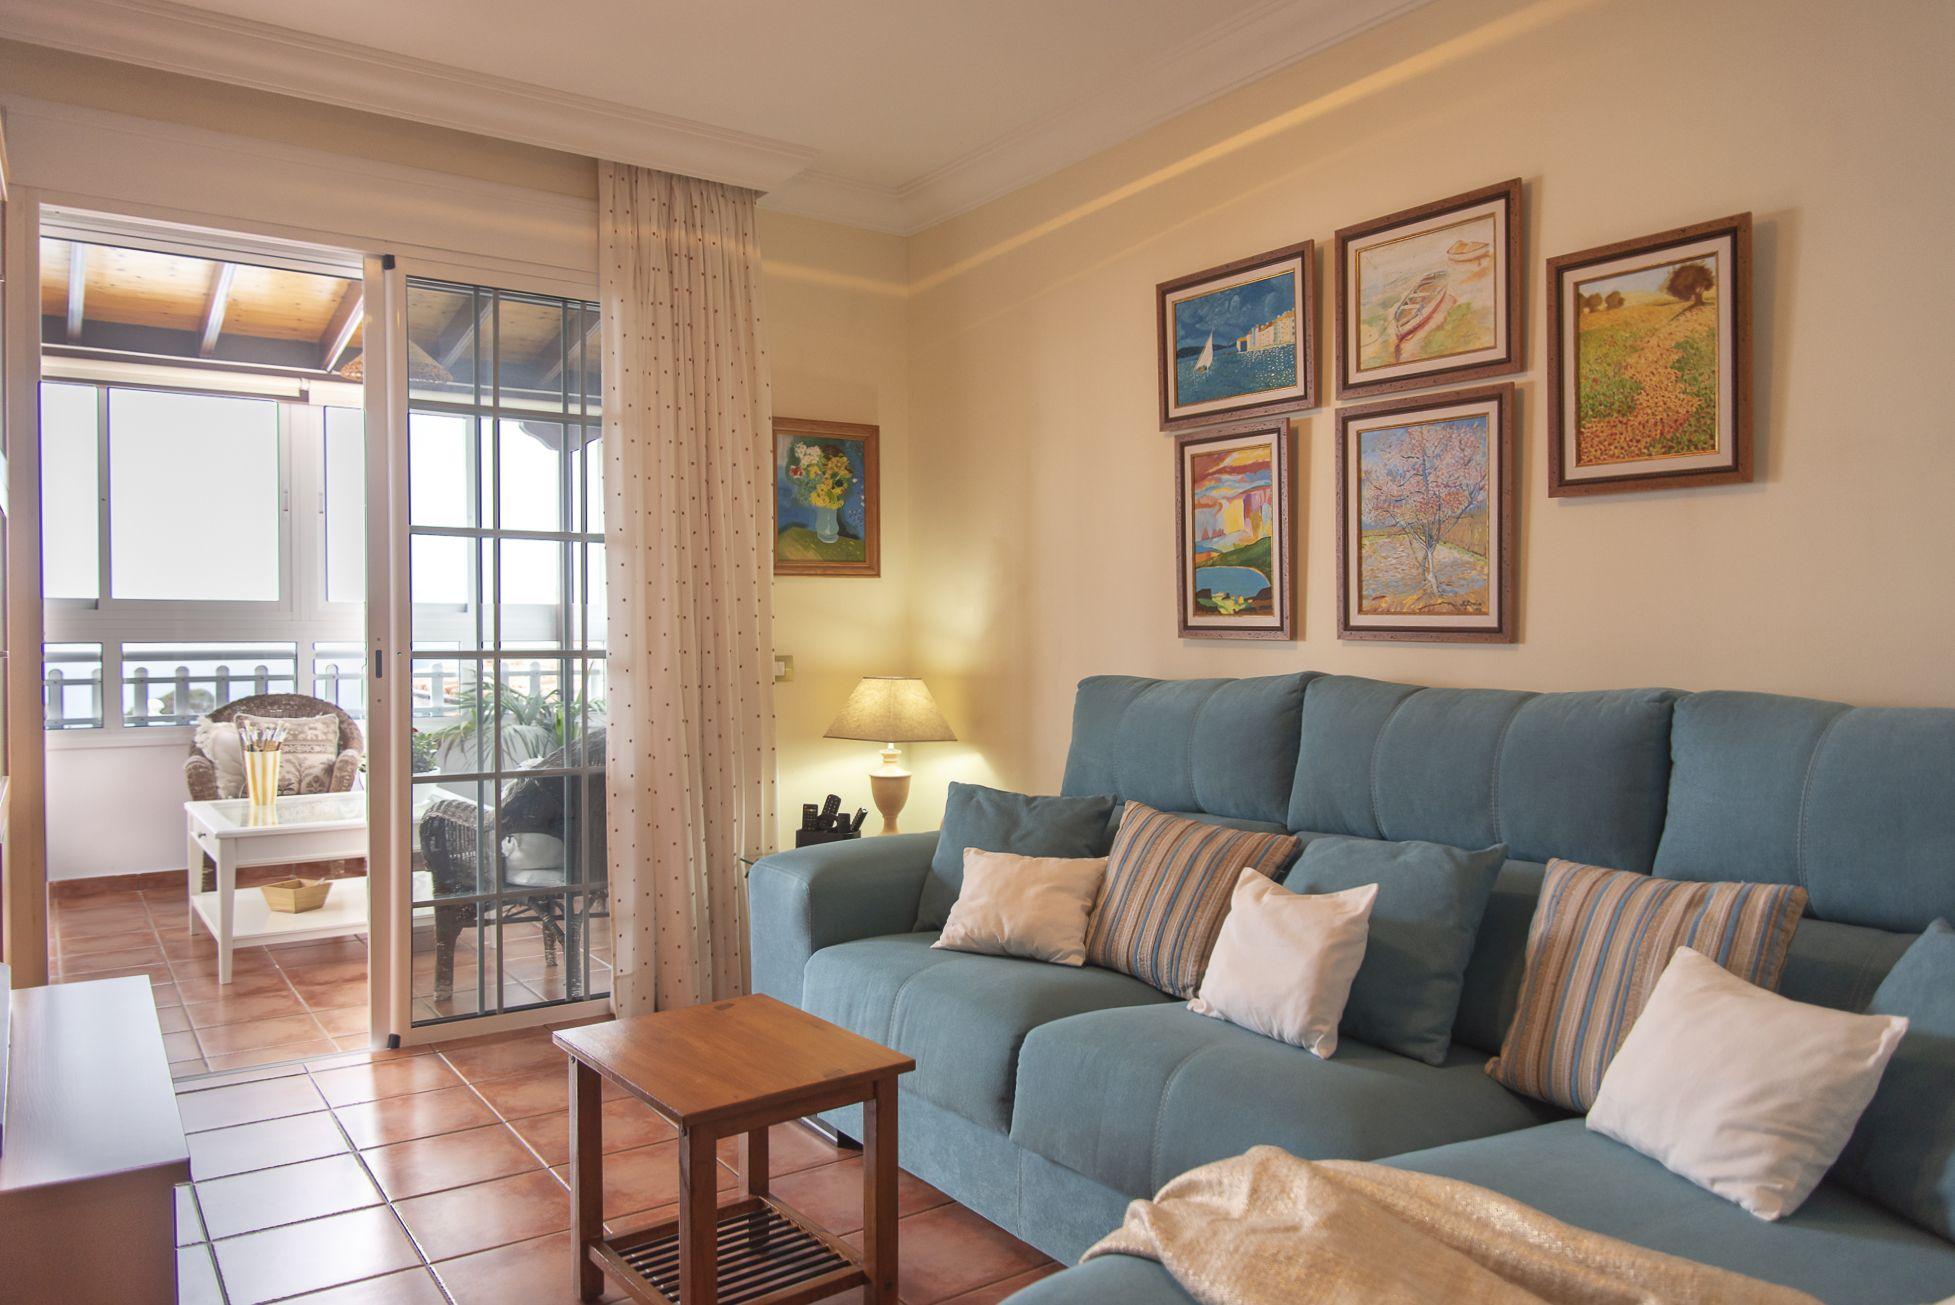 La Casa Azul - Tegueste. Salón TV cerca al salón comedor